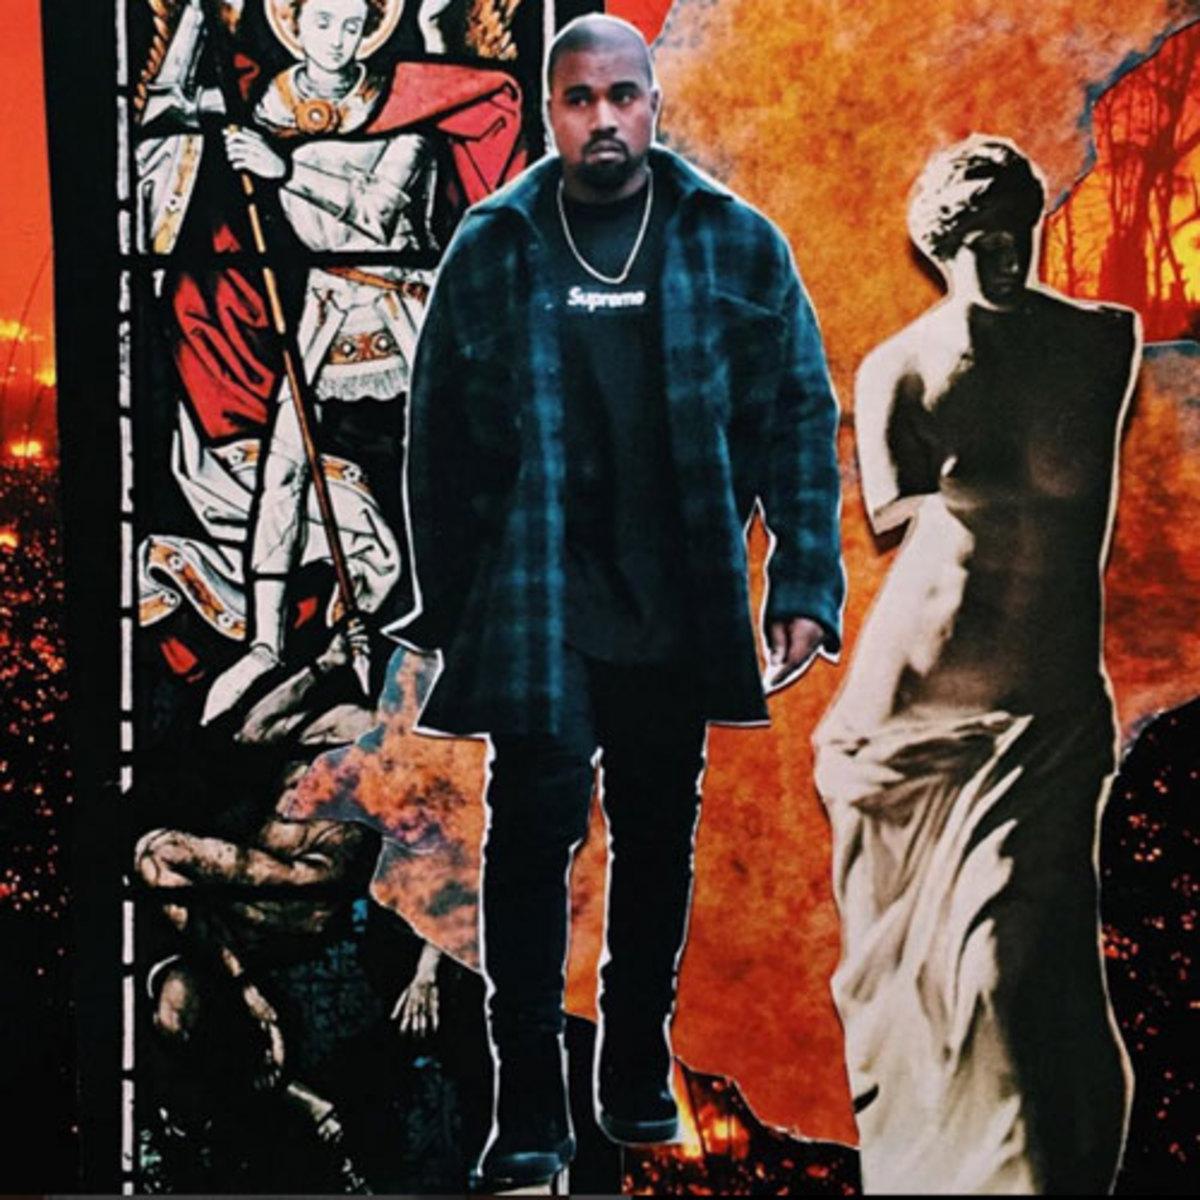 Hip hops best worst album namers djbooth album namers updateg in the malvernweather Images